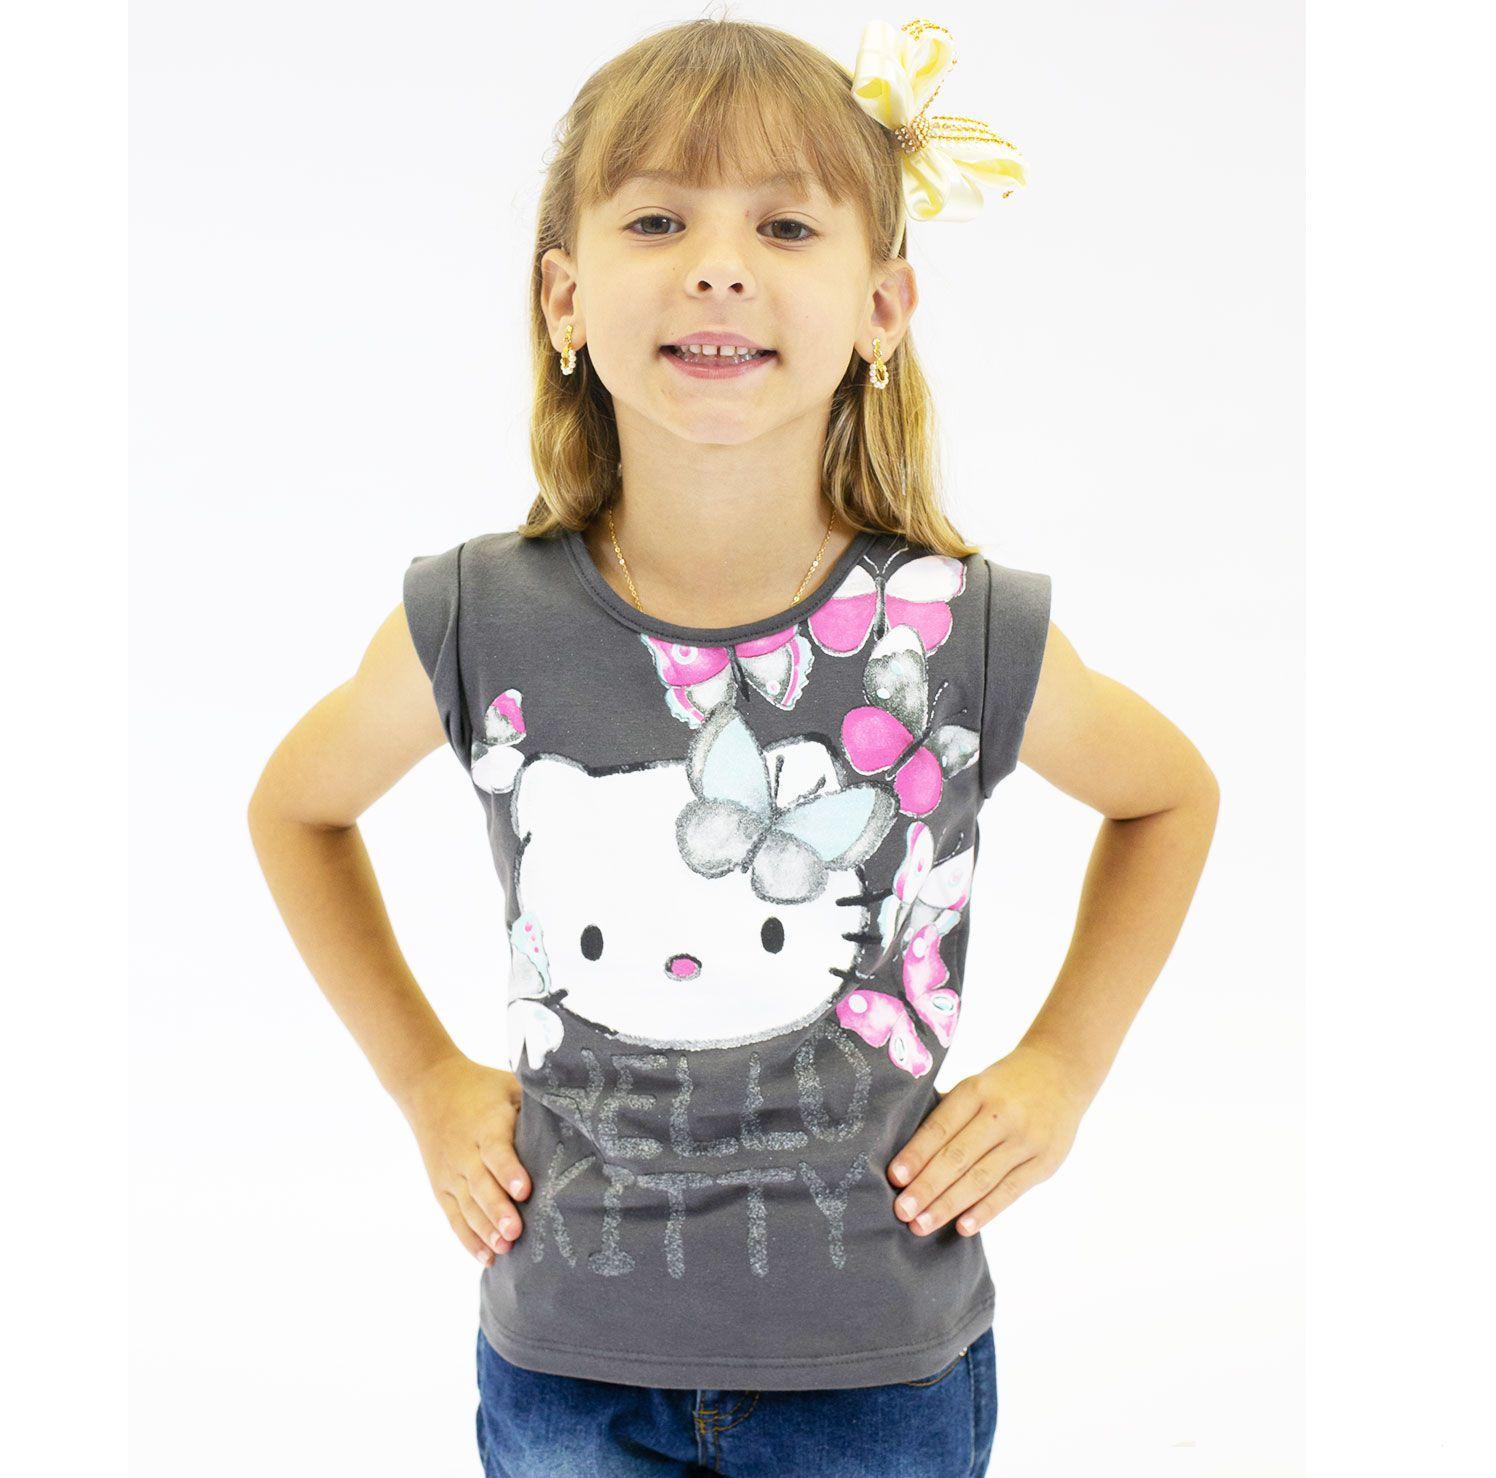 BLUSA INFANTIL HELLO KITTY REF:87652 4/8